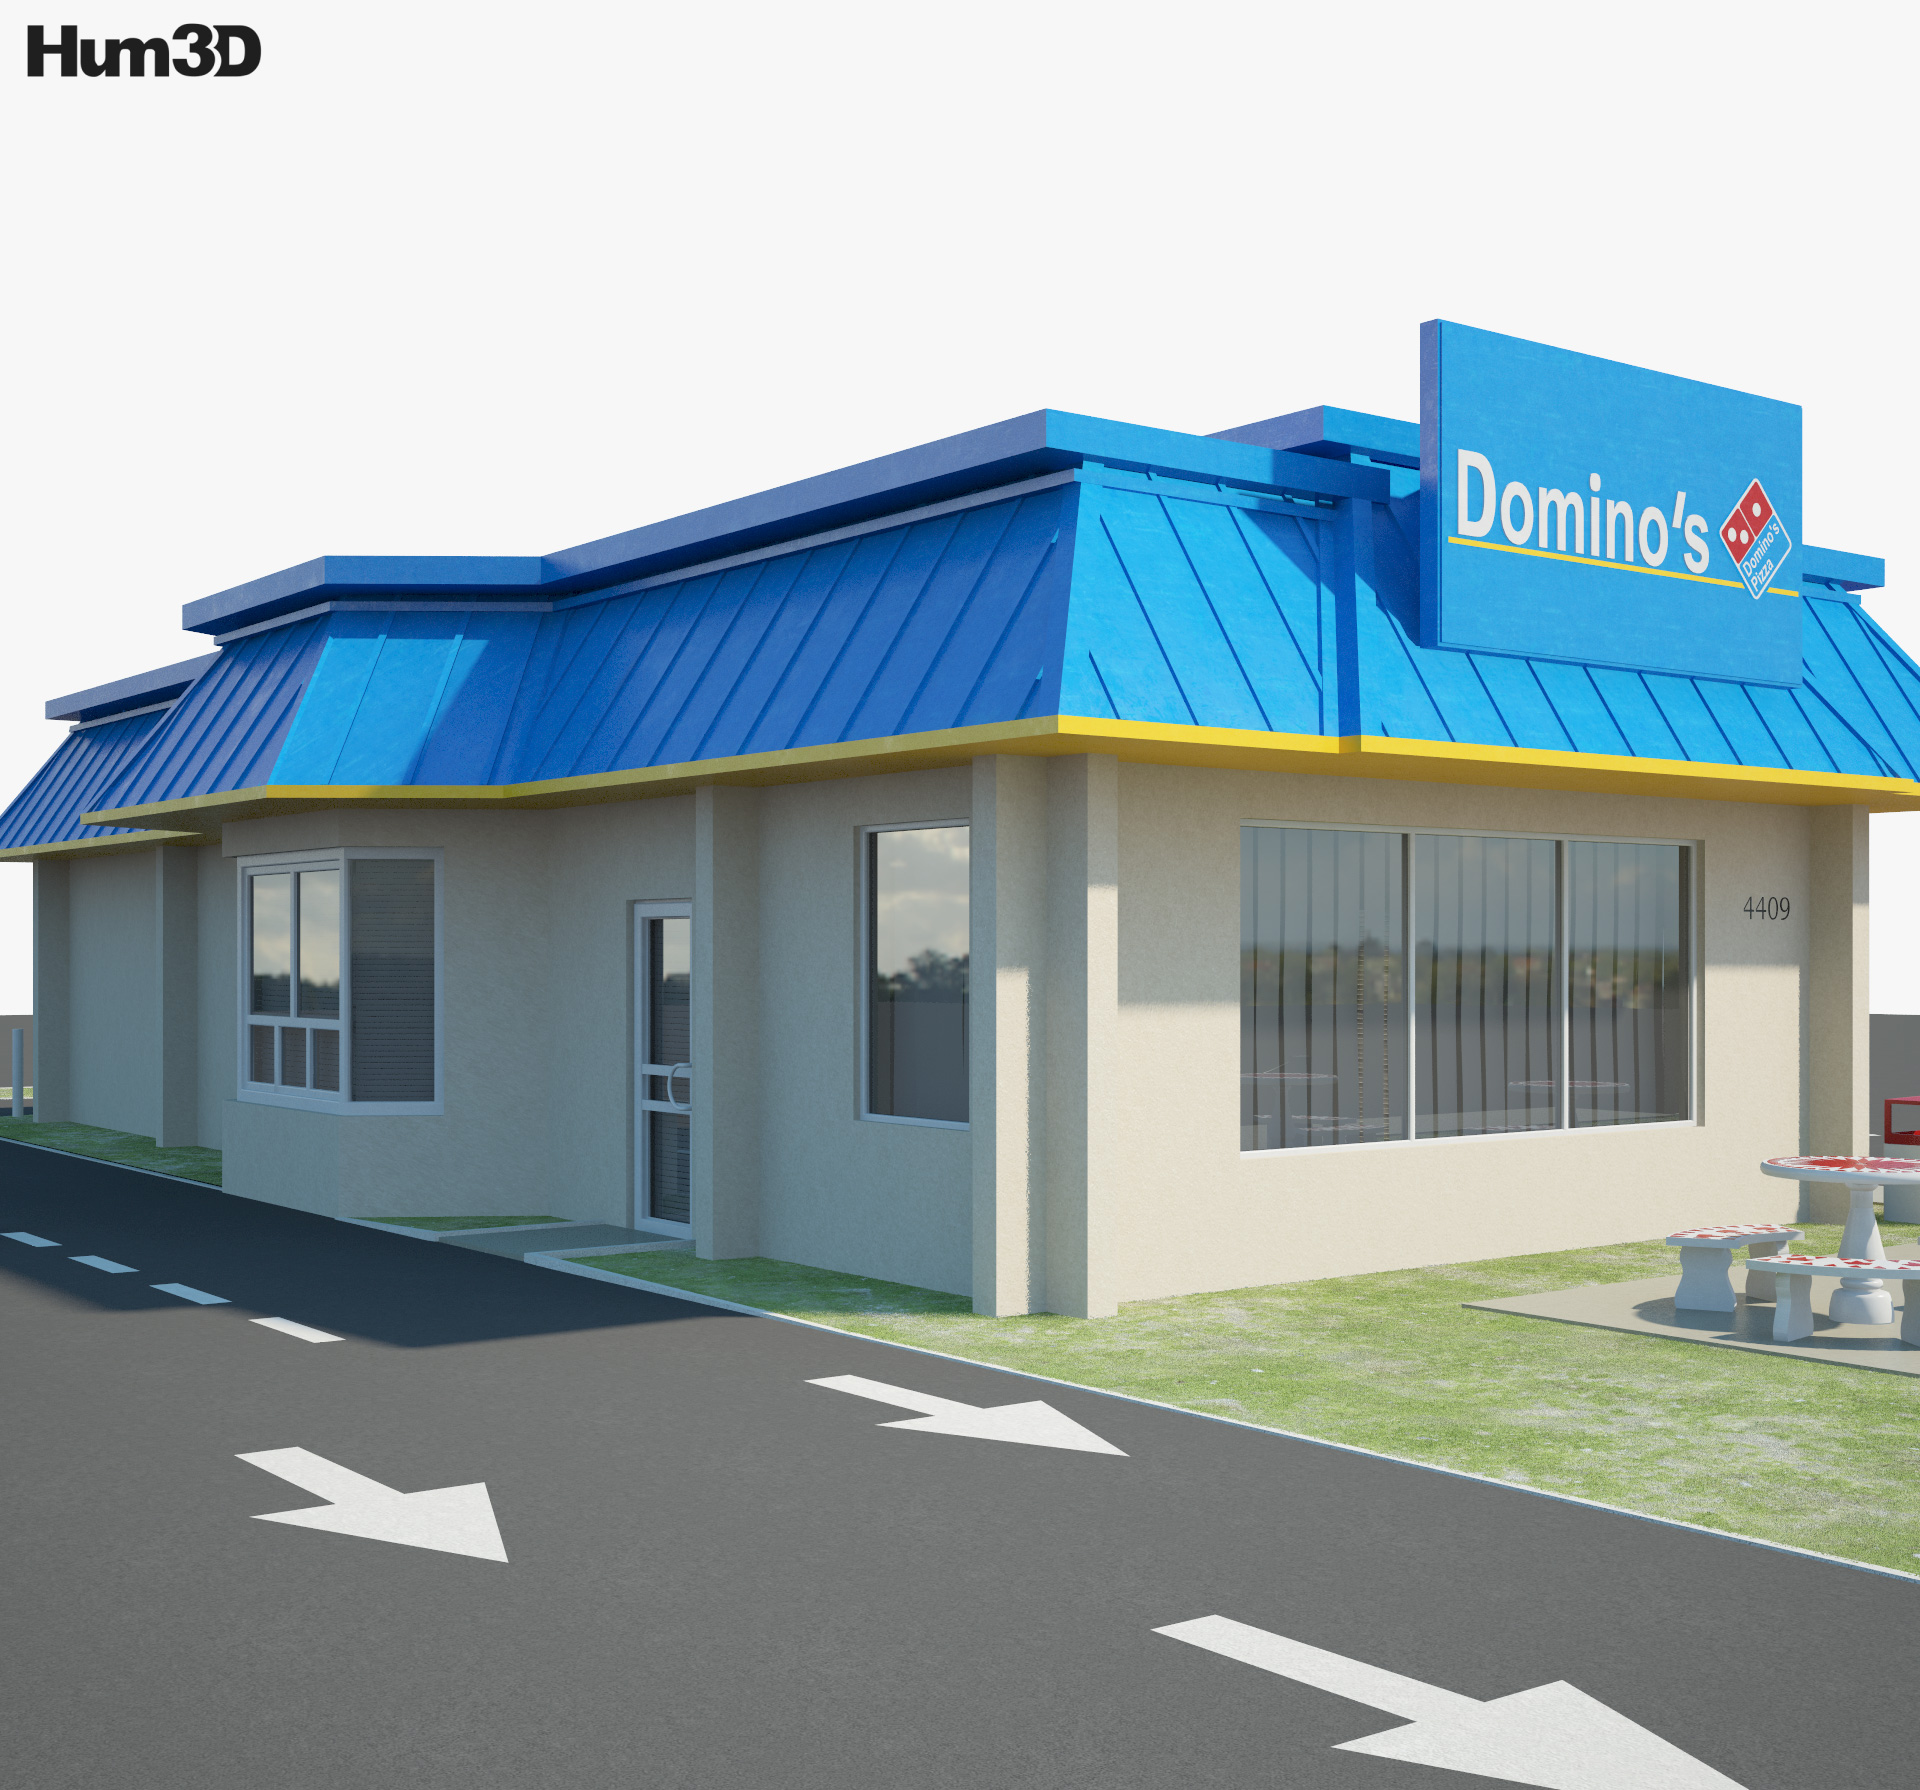 Domino's Pizza Restaurant 03 3d model